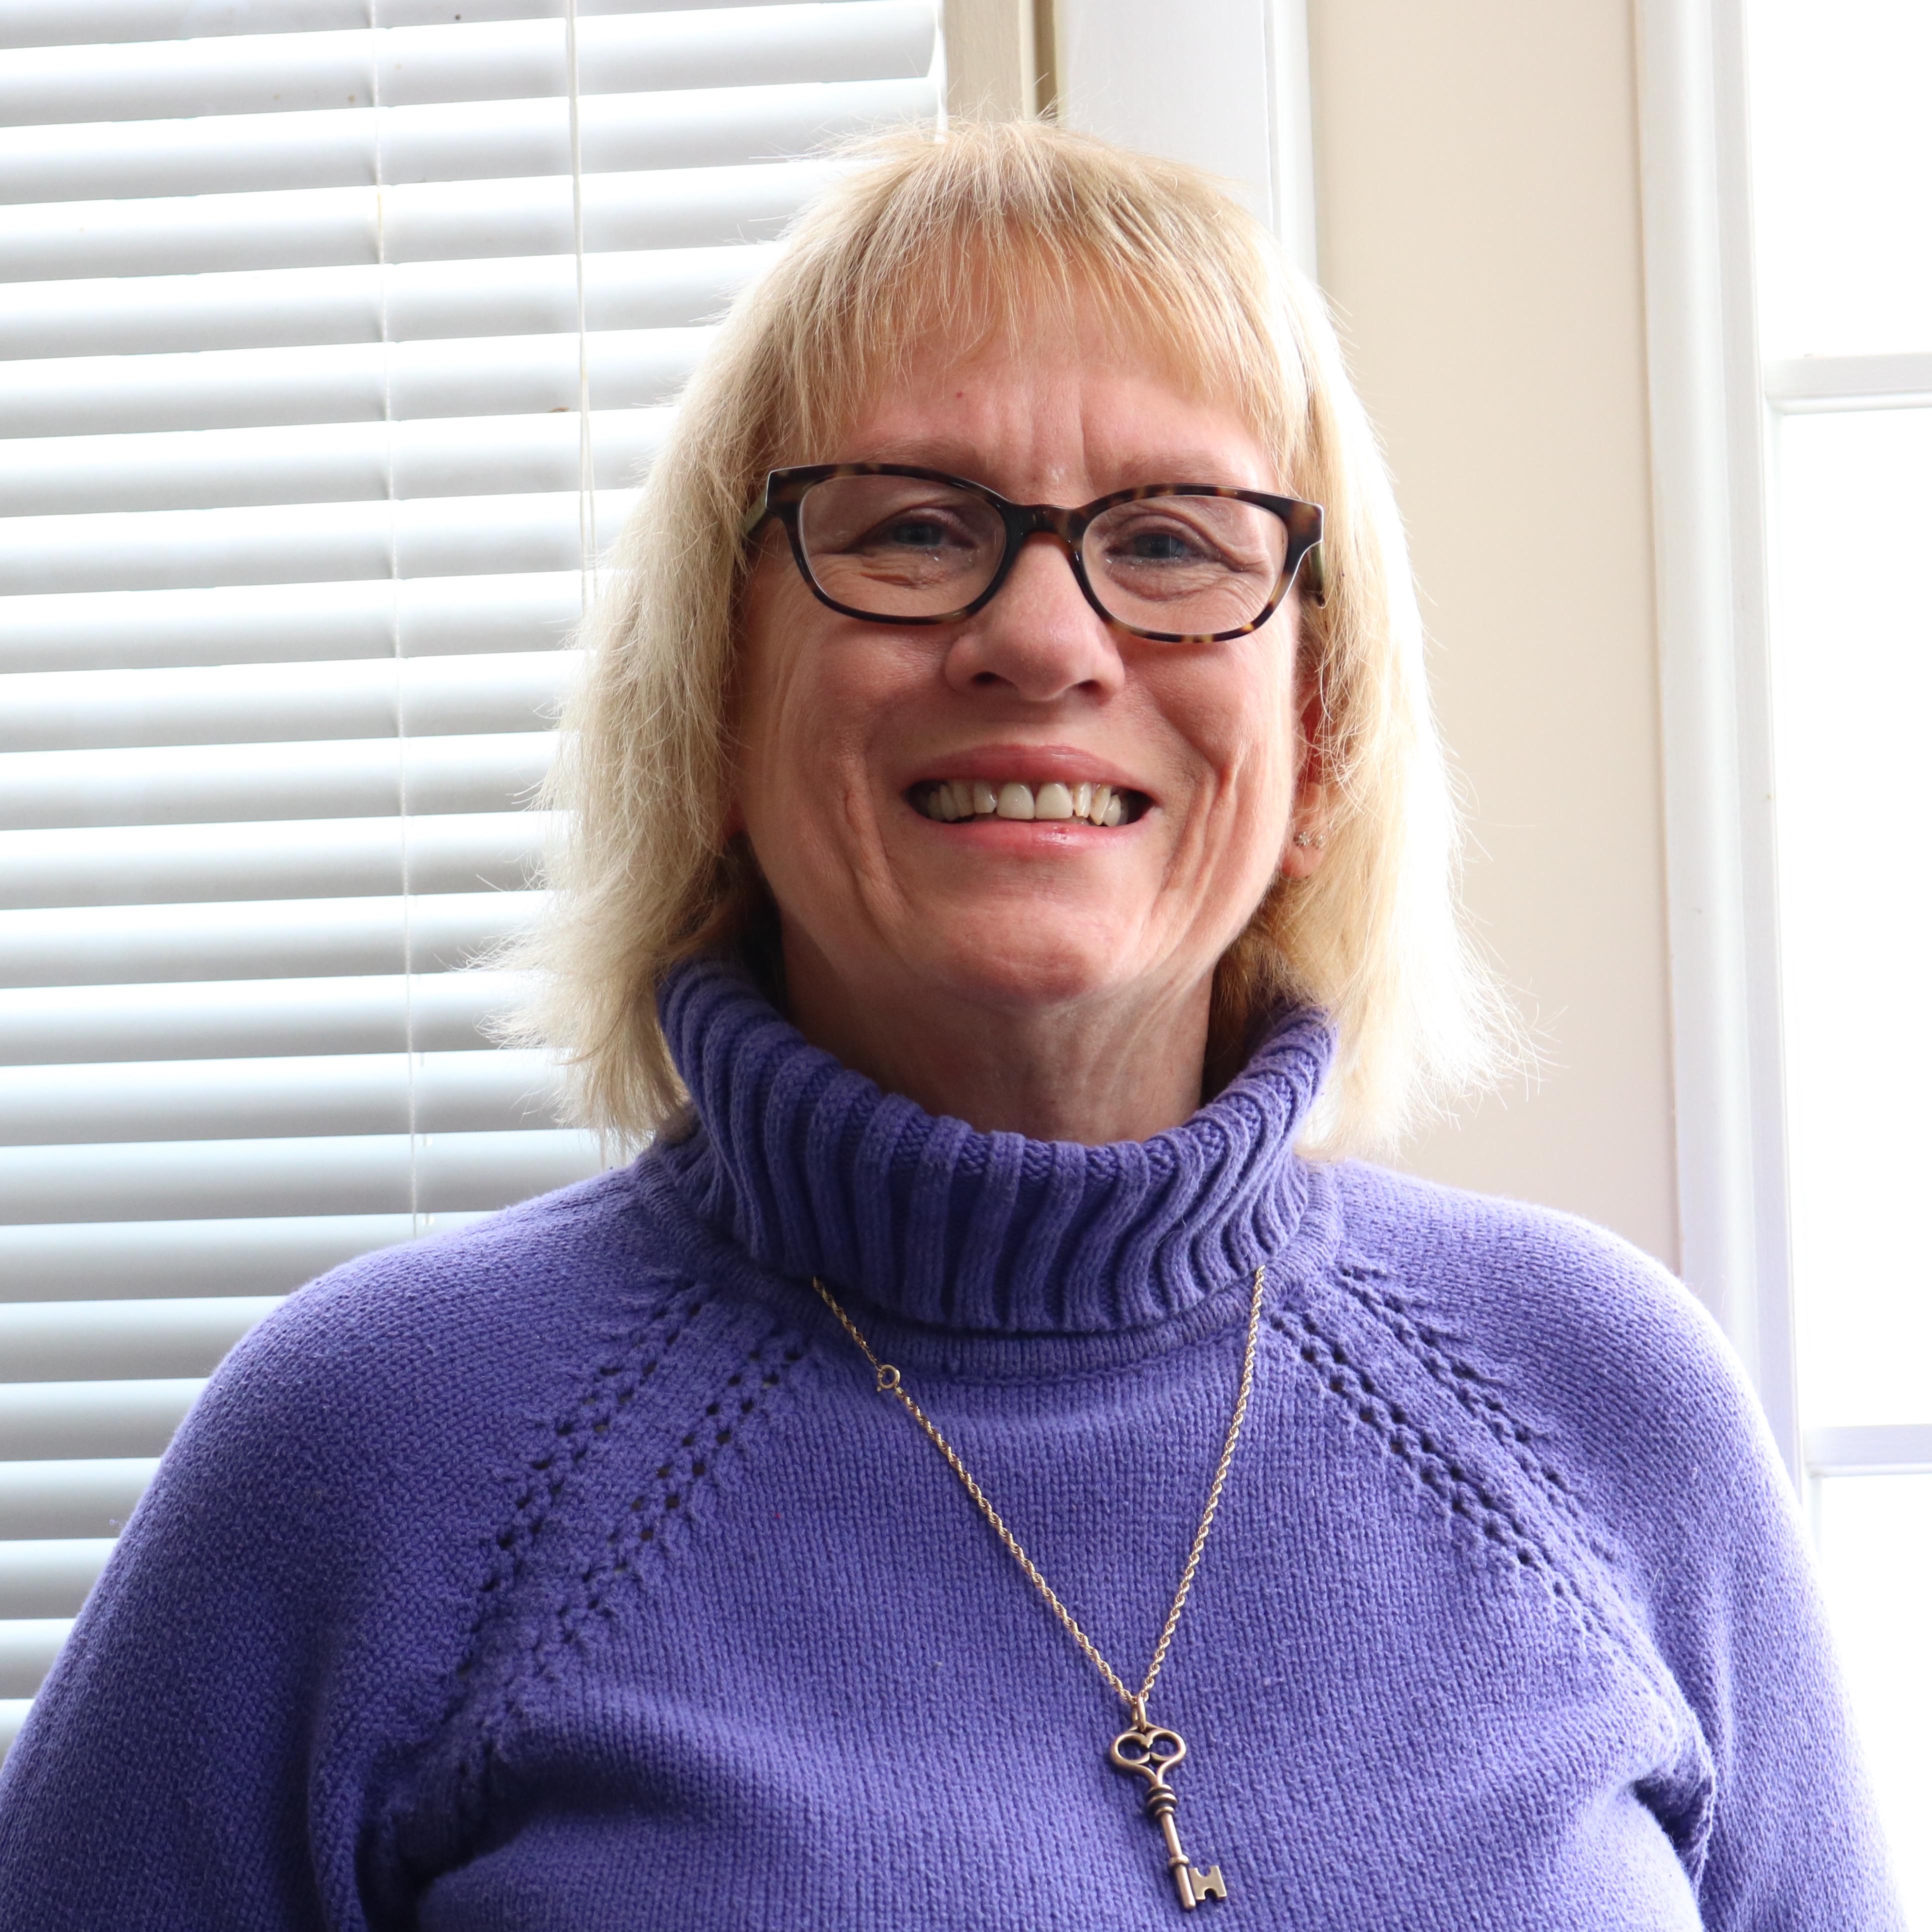 Mae O'Brien